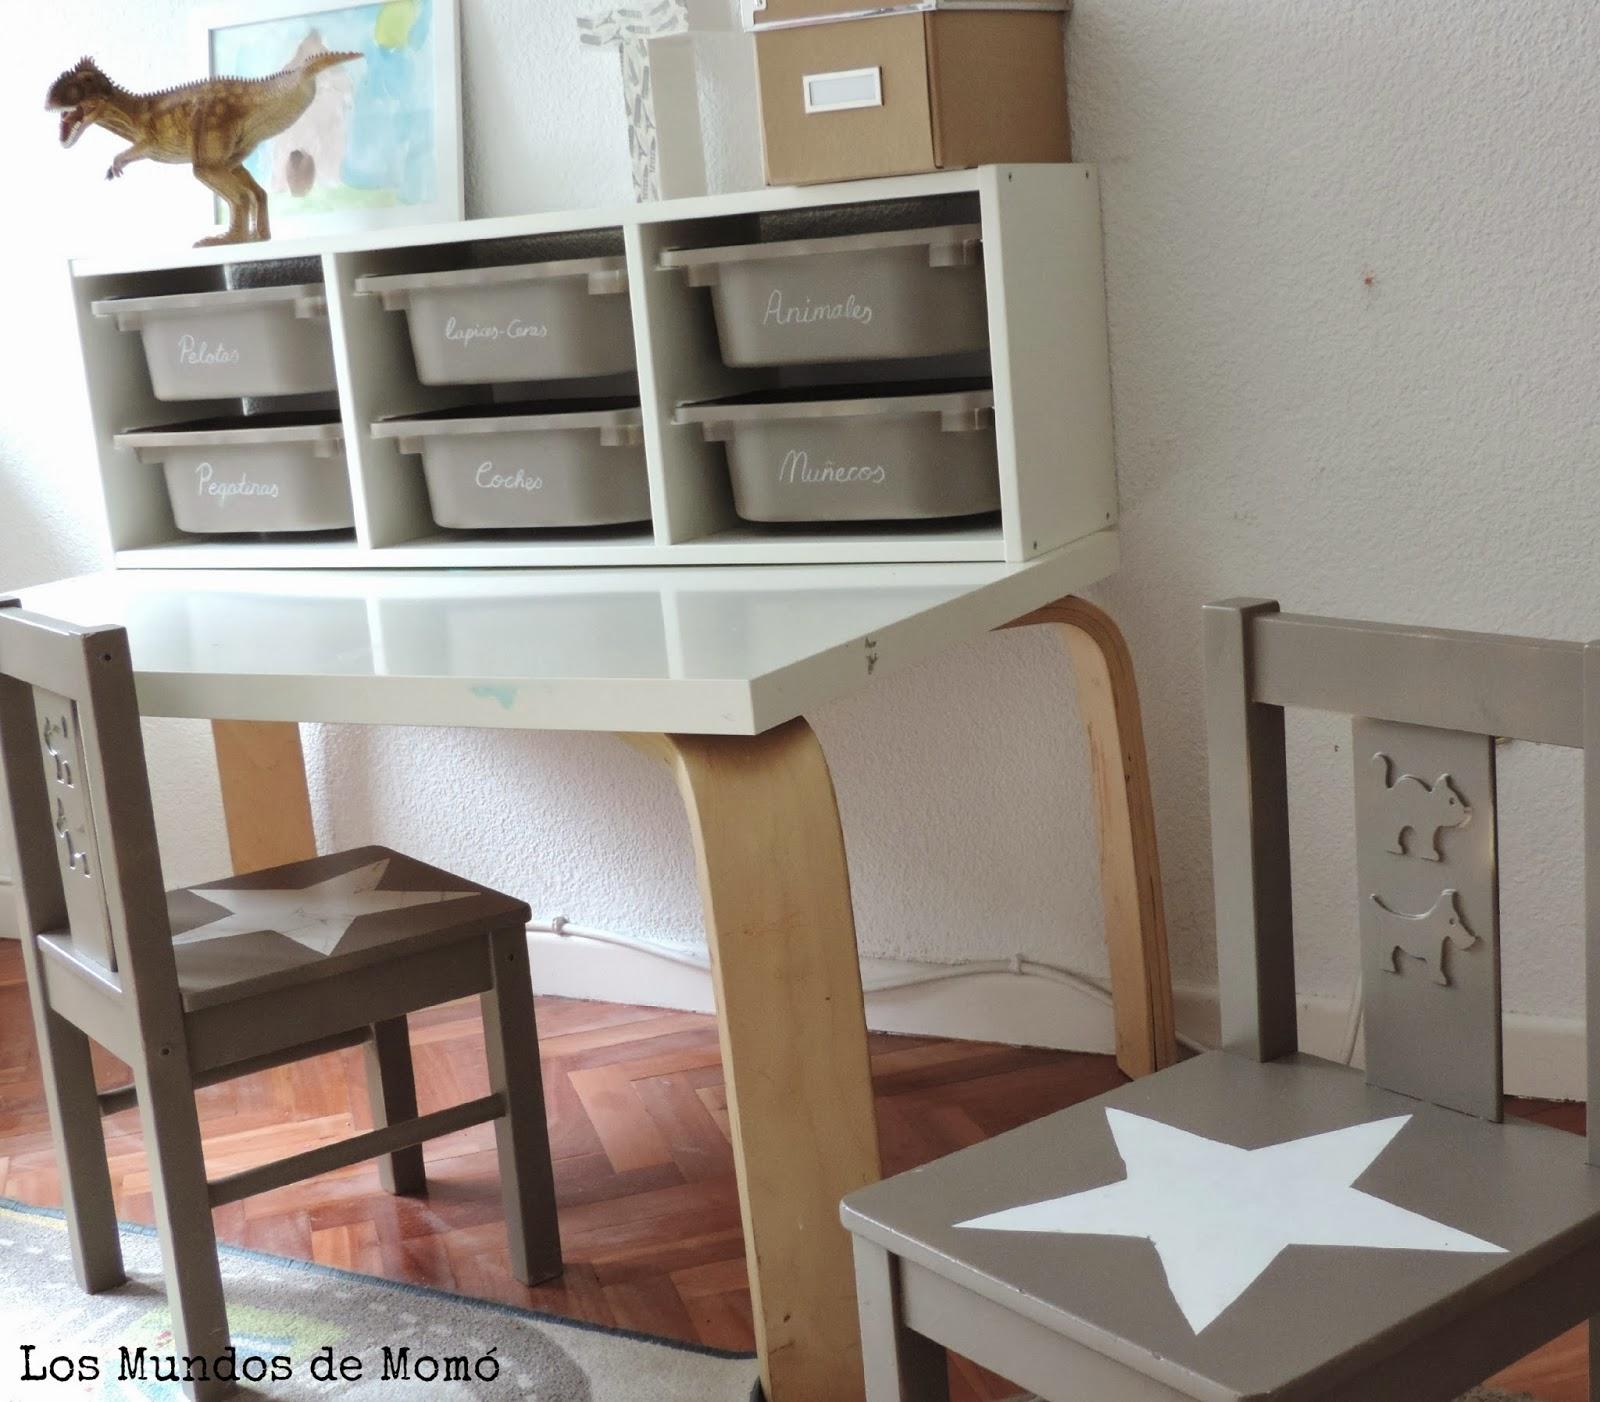 Personaliza tus muebles de ikea handbox - Ikea muebles infantiles ...